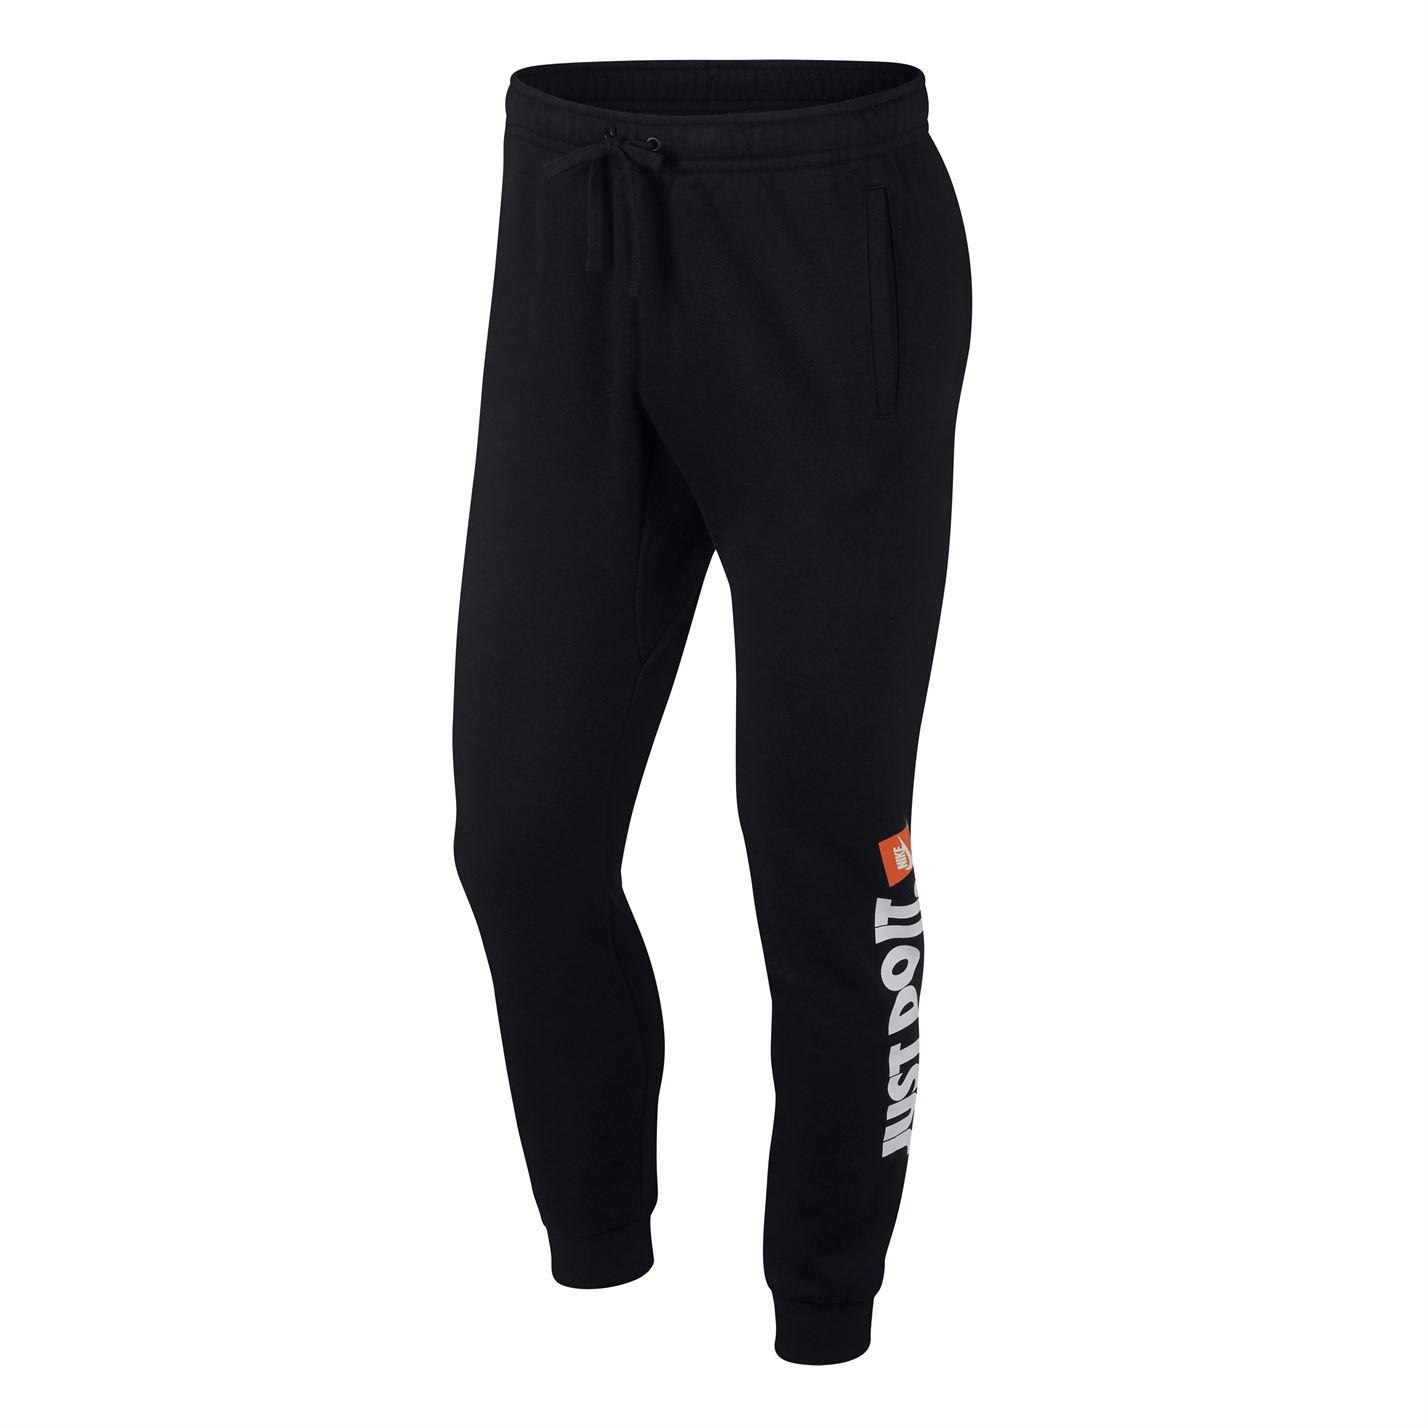 Nike Just Do It Joggers pánské